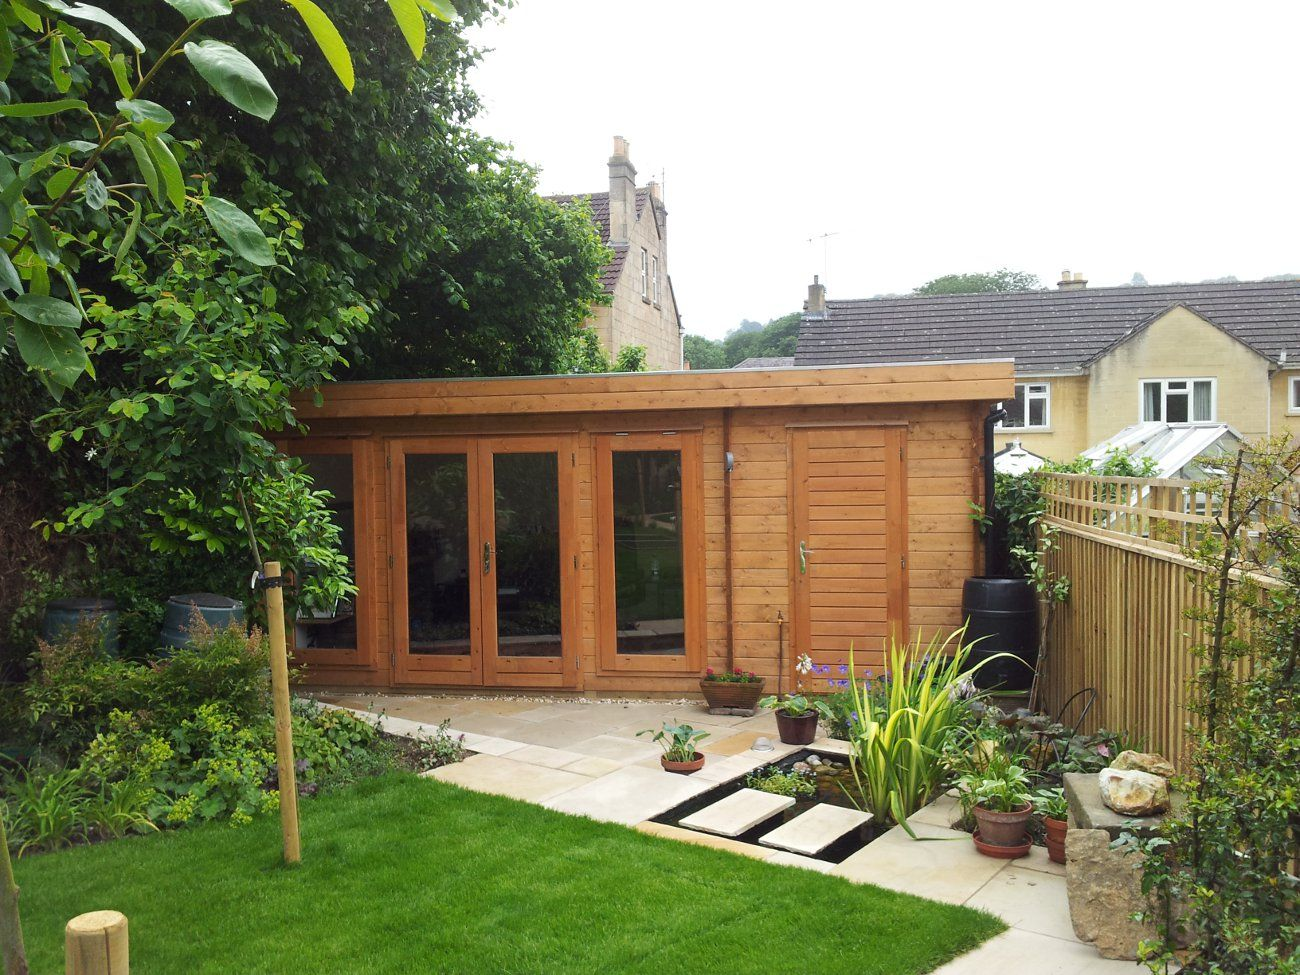 Pin By Jamie Coleman Braddock On Garden Log Cabins Summer House Garden Garden Office Shed Garden Log Cabins